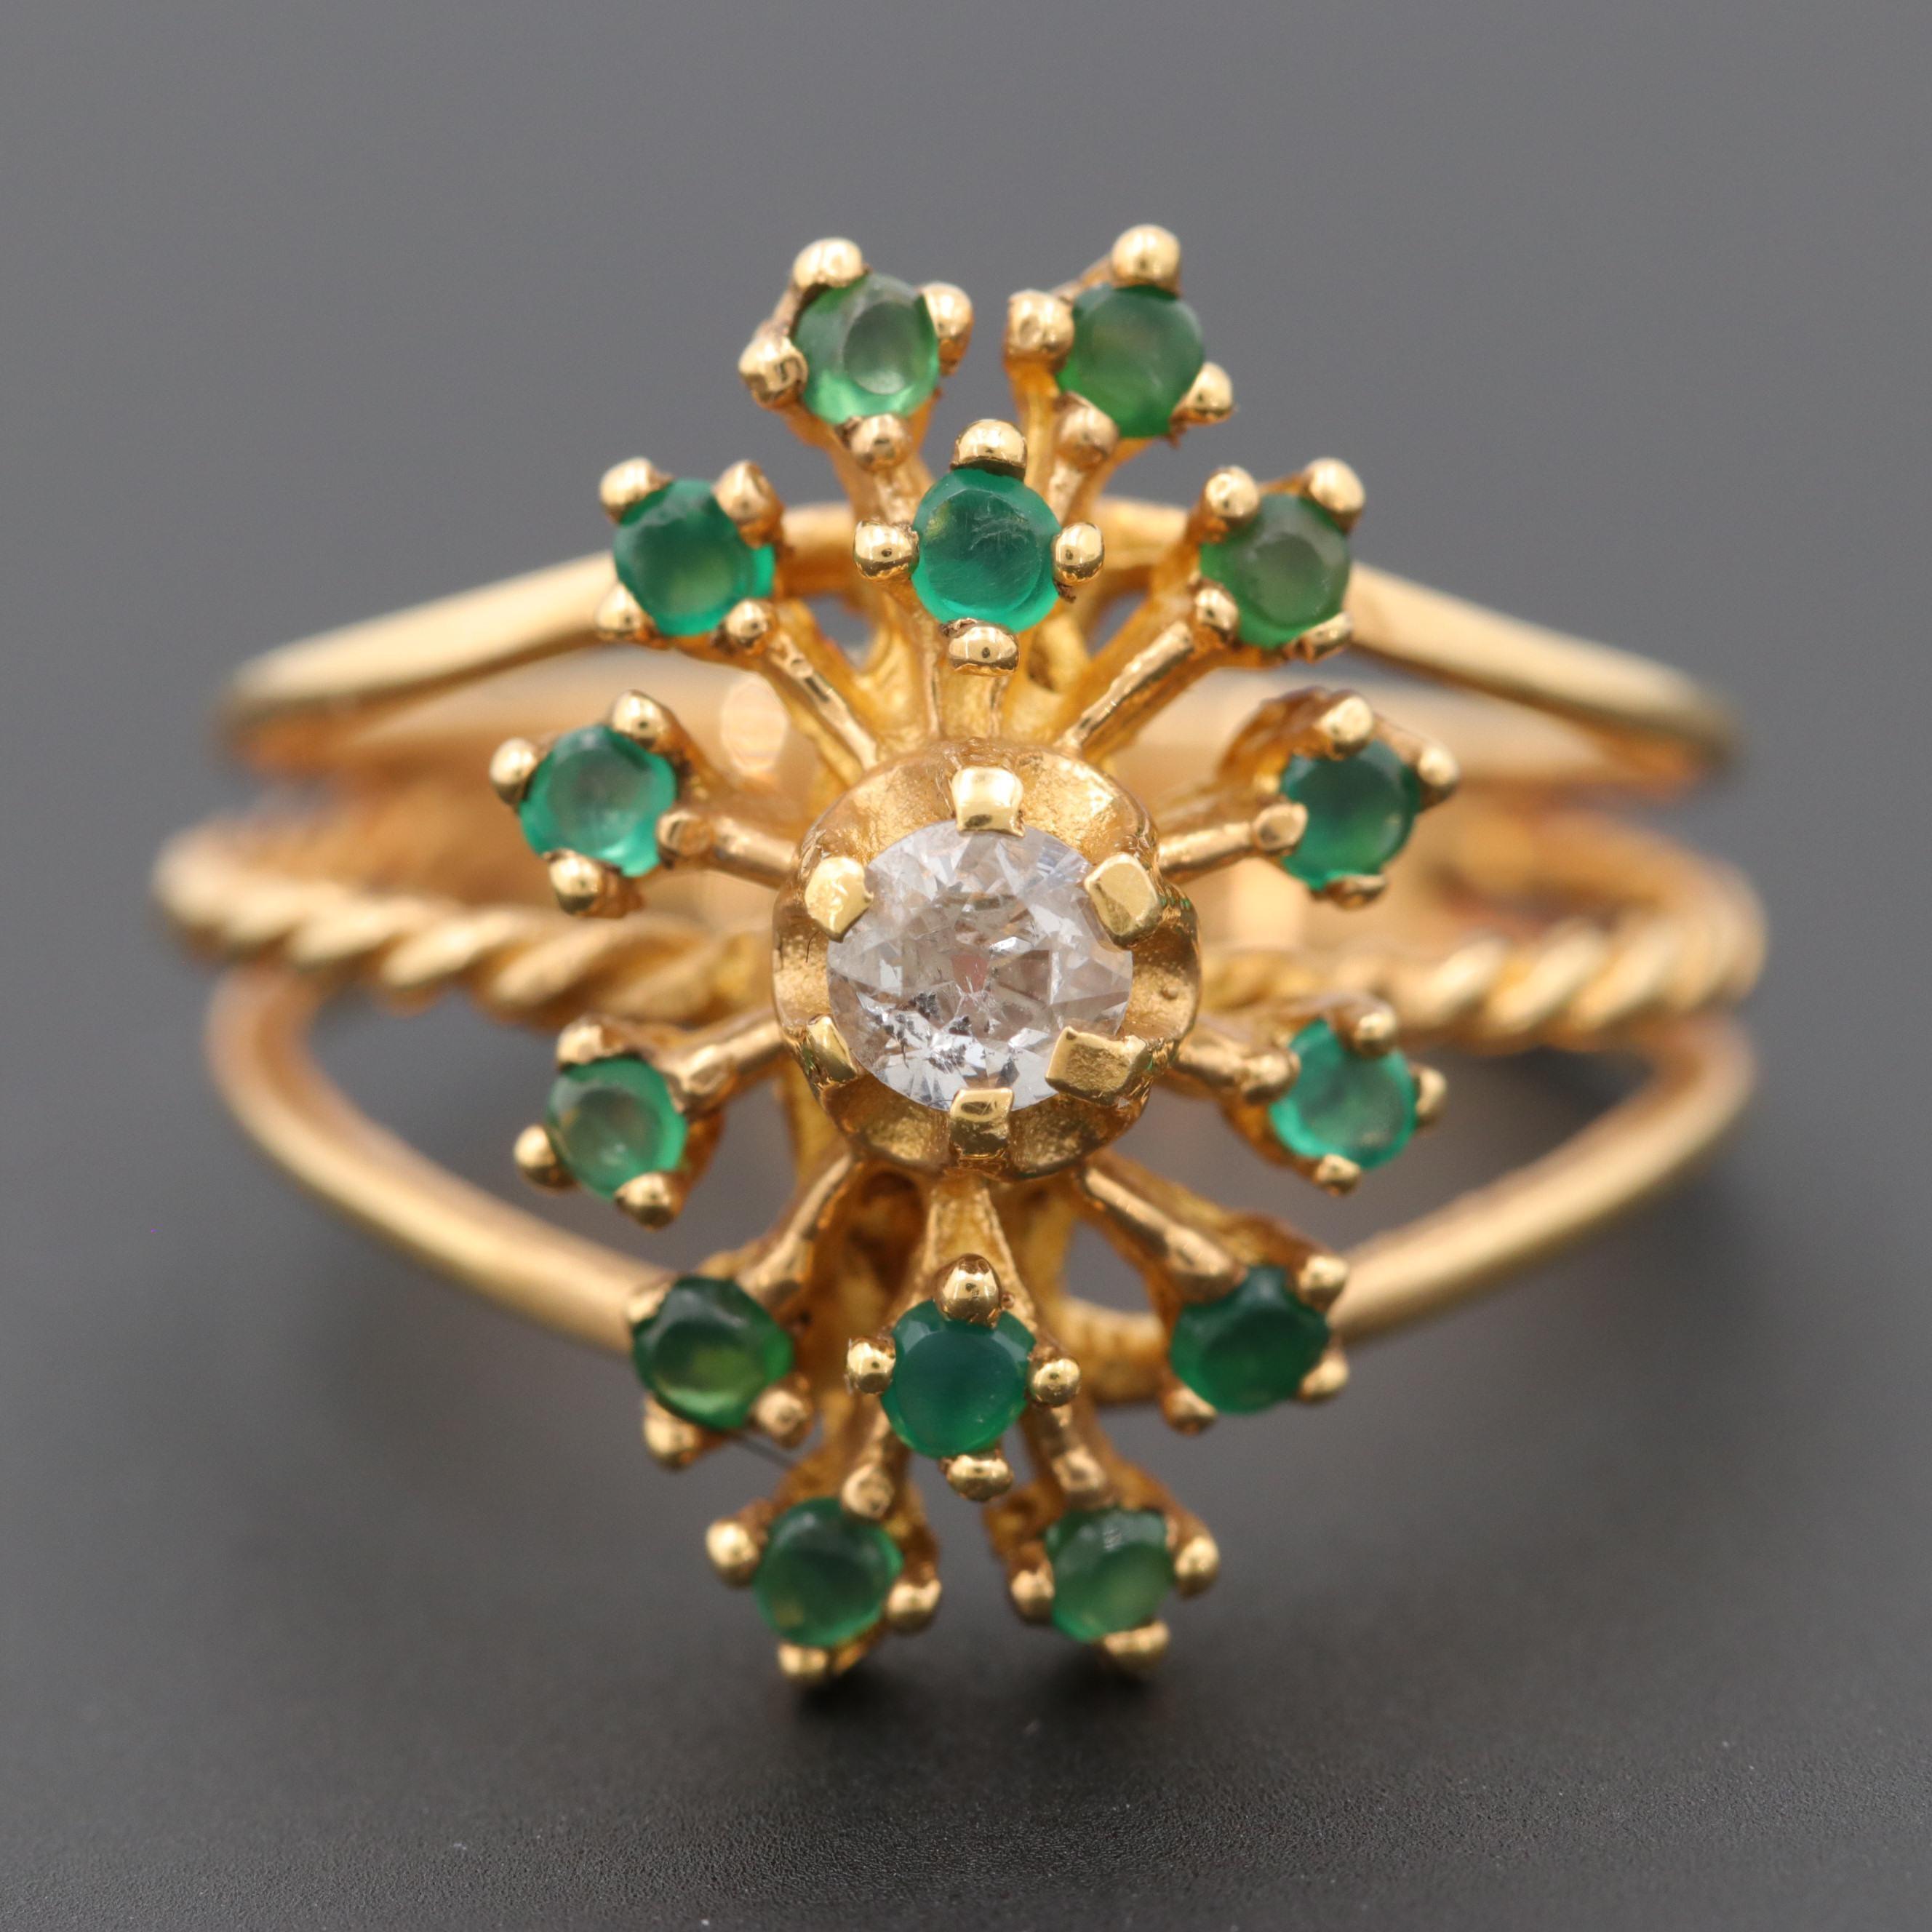 18K Yellow Gold Diamond and Chalcedony Ring